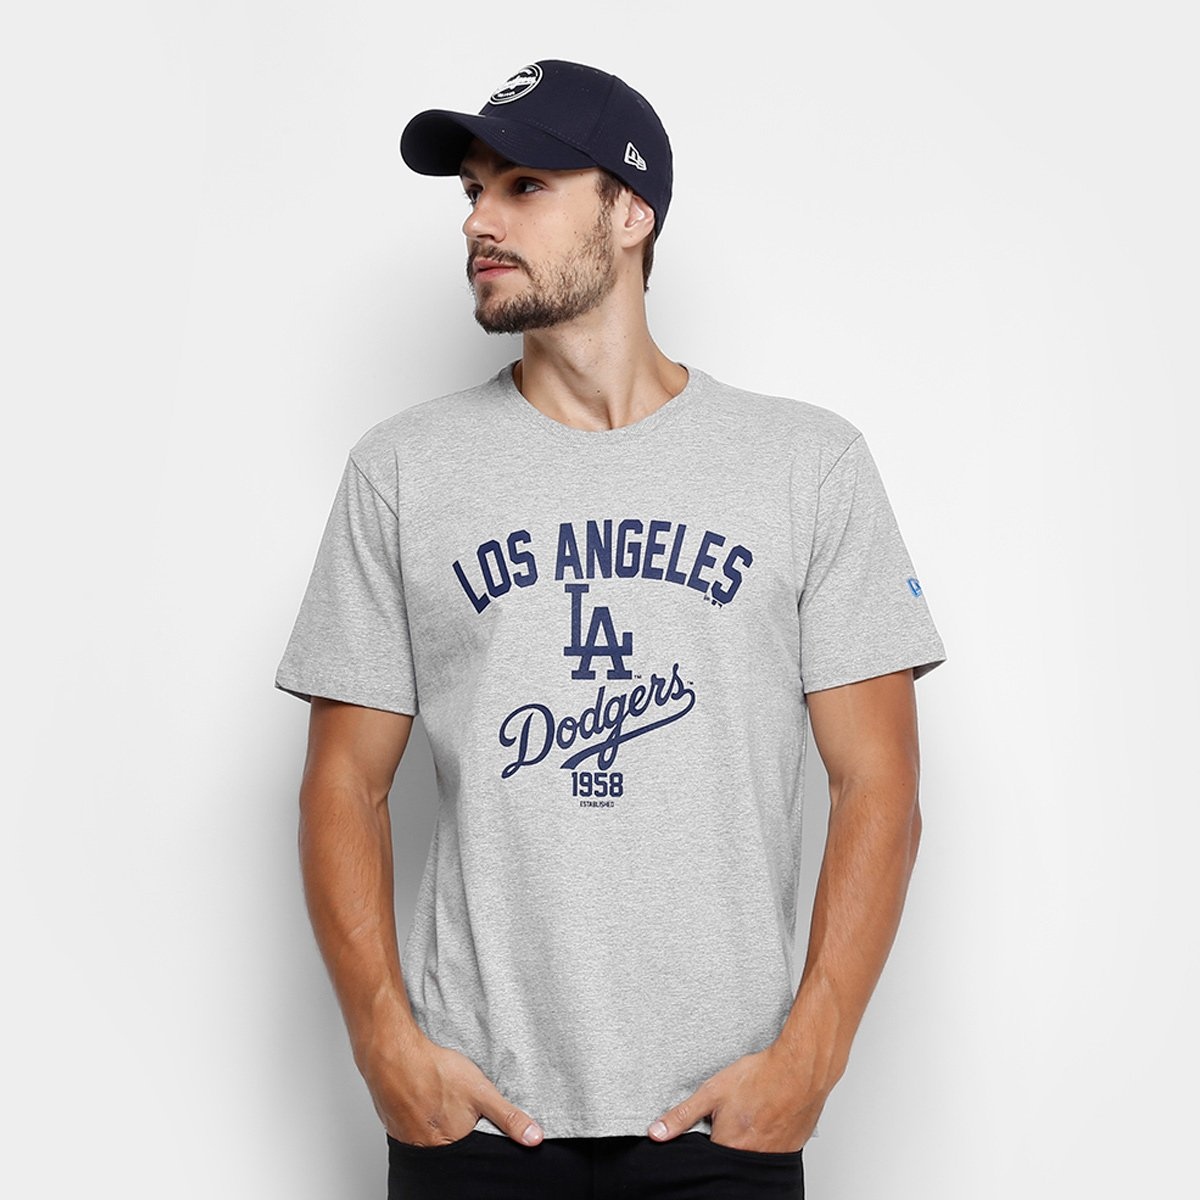 c63993026548a Camiseta MLB Los Angeles Dodgers New Era Righ 3 Masculina - Compre Agora